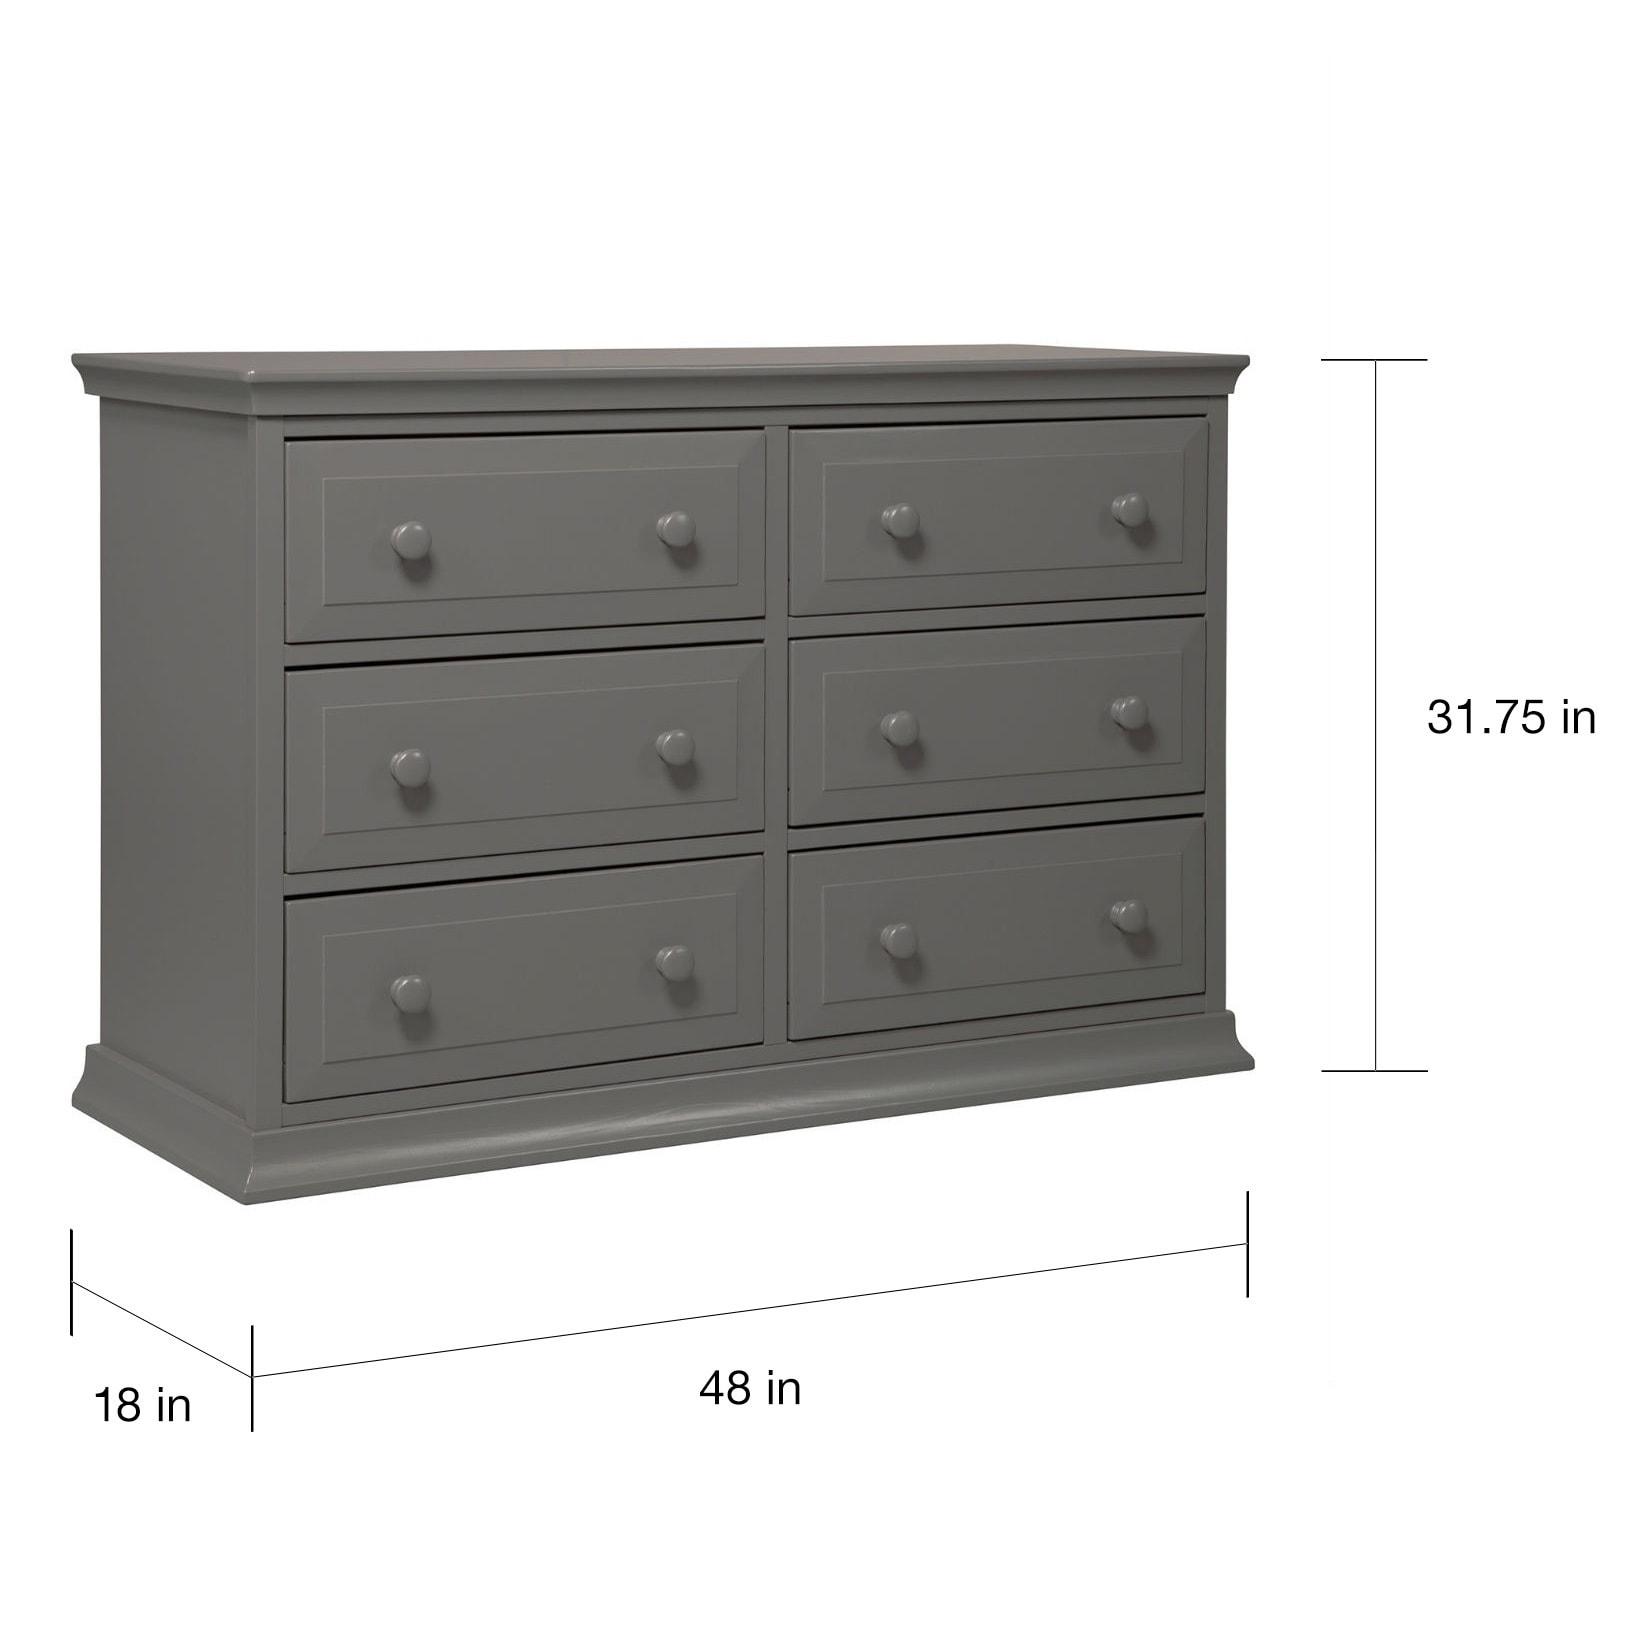 welcome chest dresser furniture cheap white smart choice knightsbridge of midi drawer